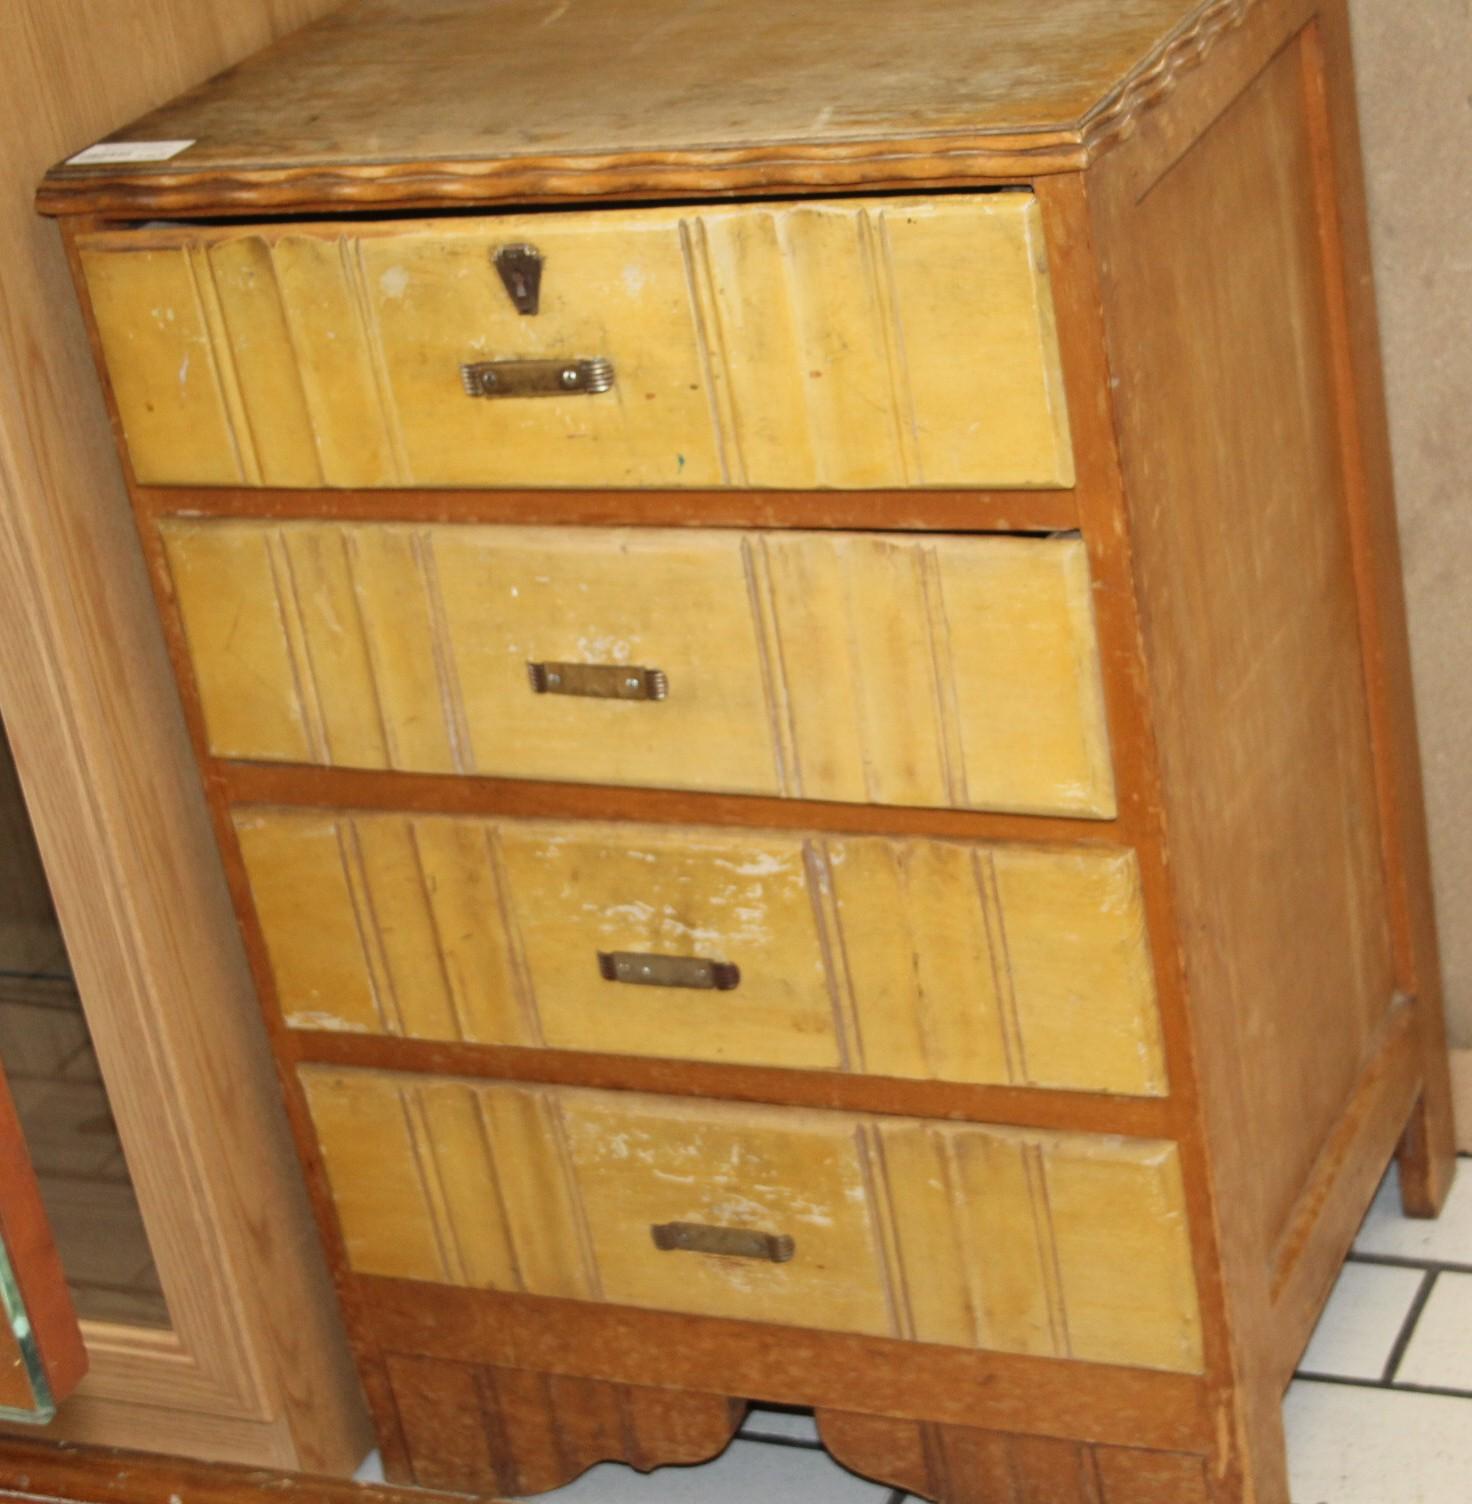 Chest of drawers S028234c #Rosettenvillepawnshop